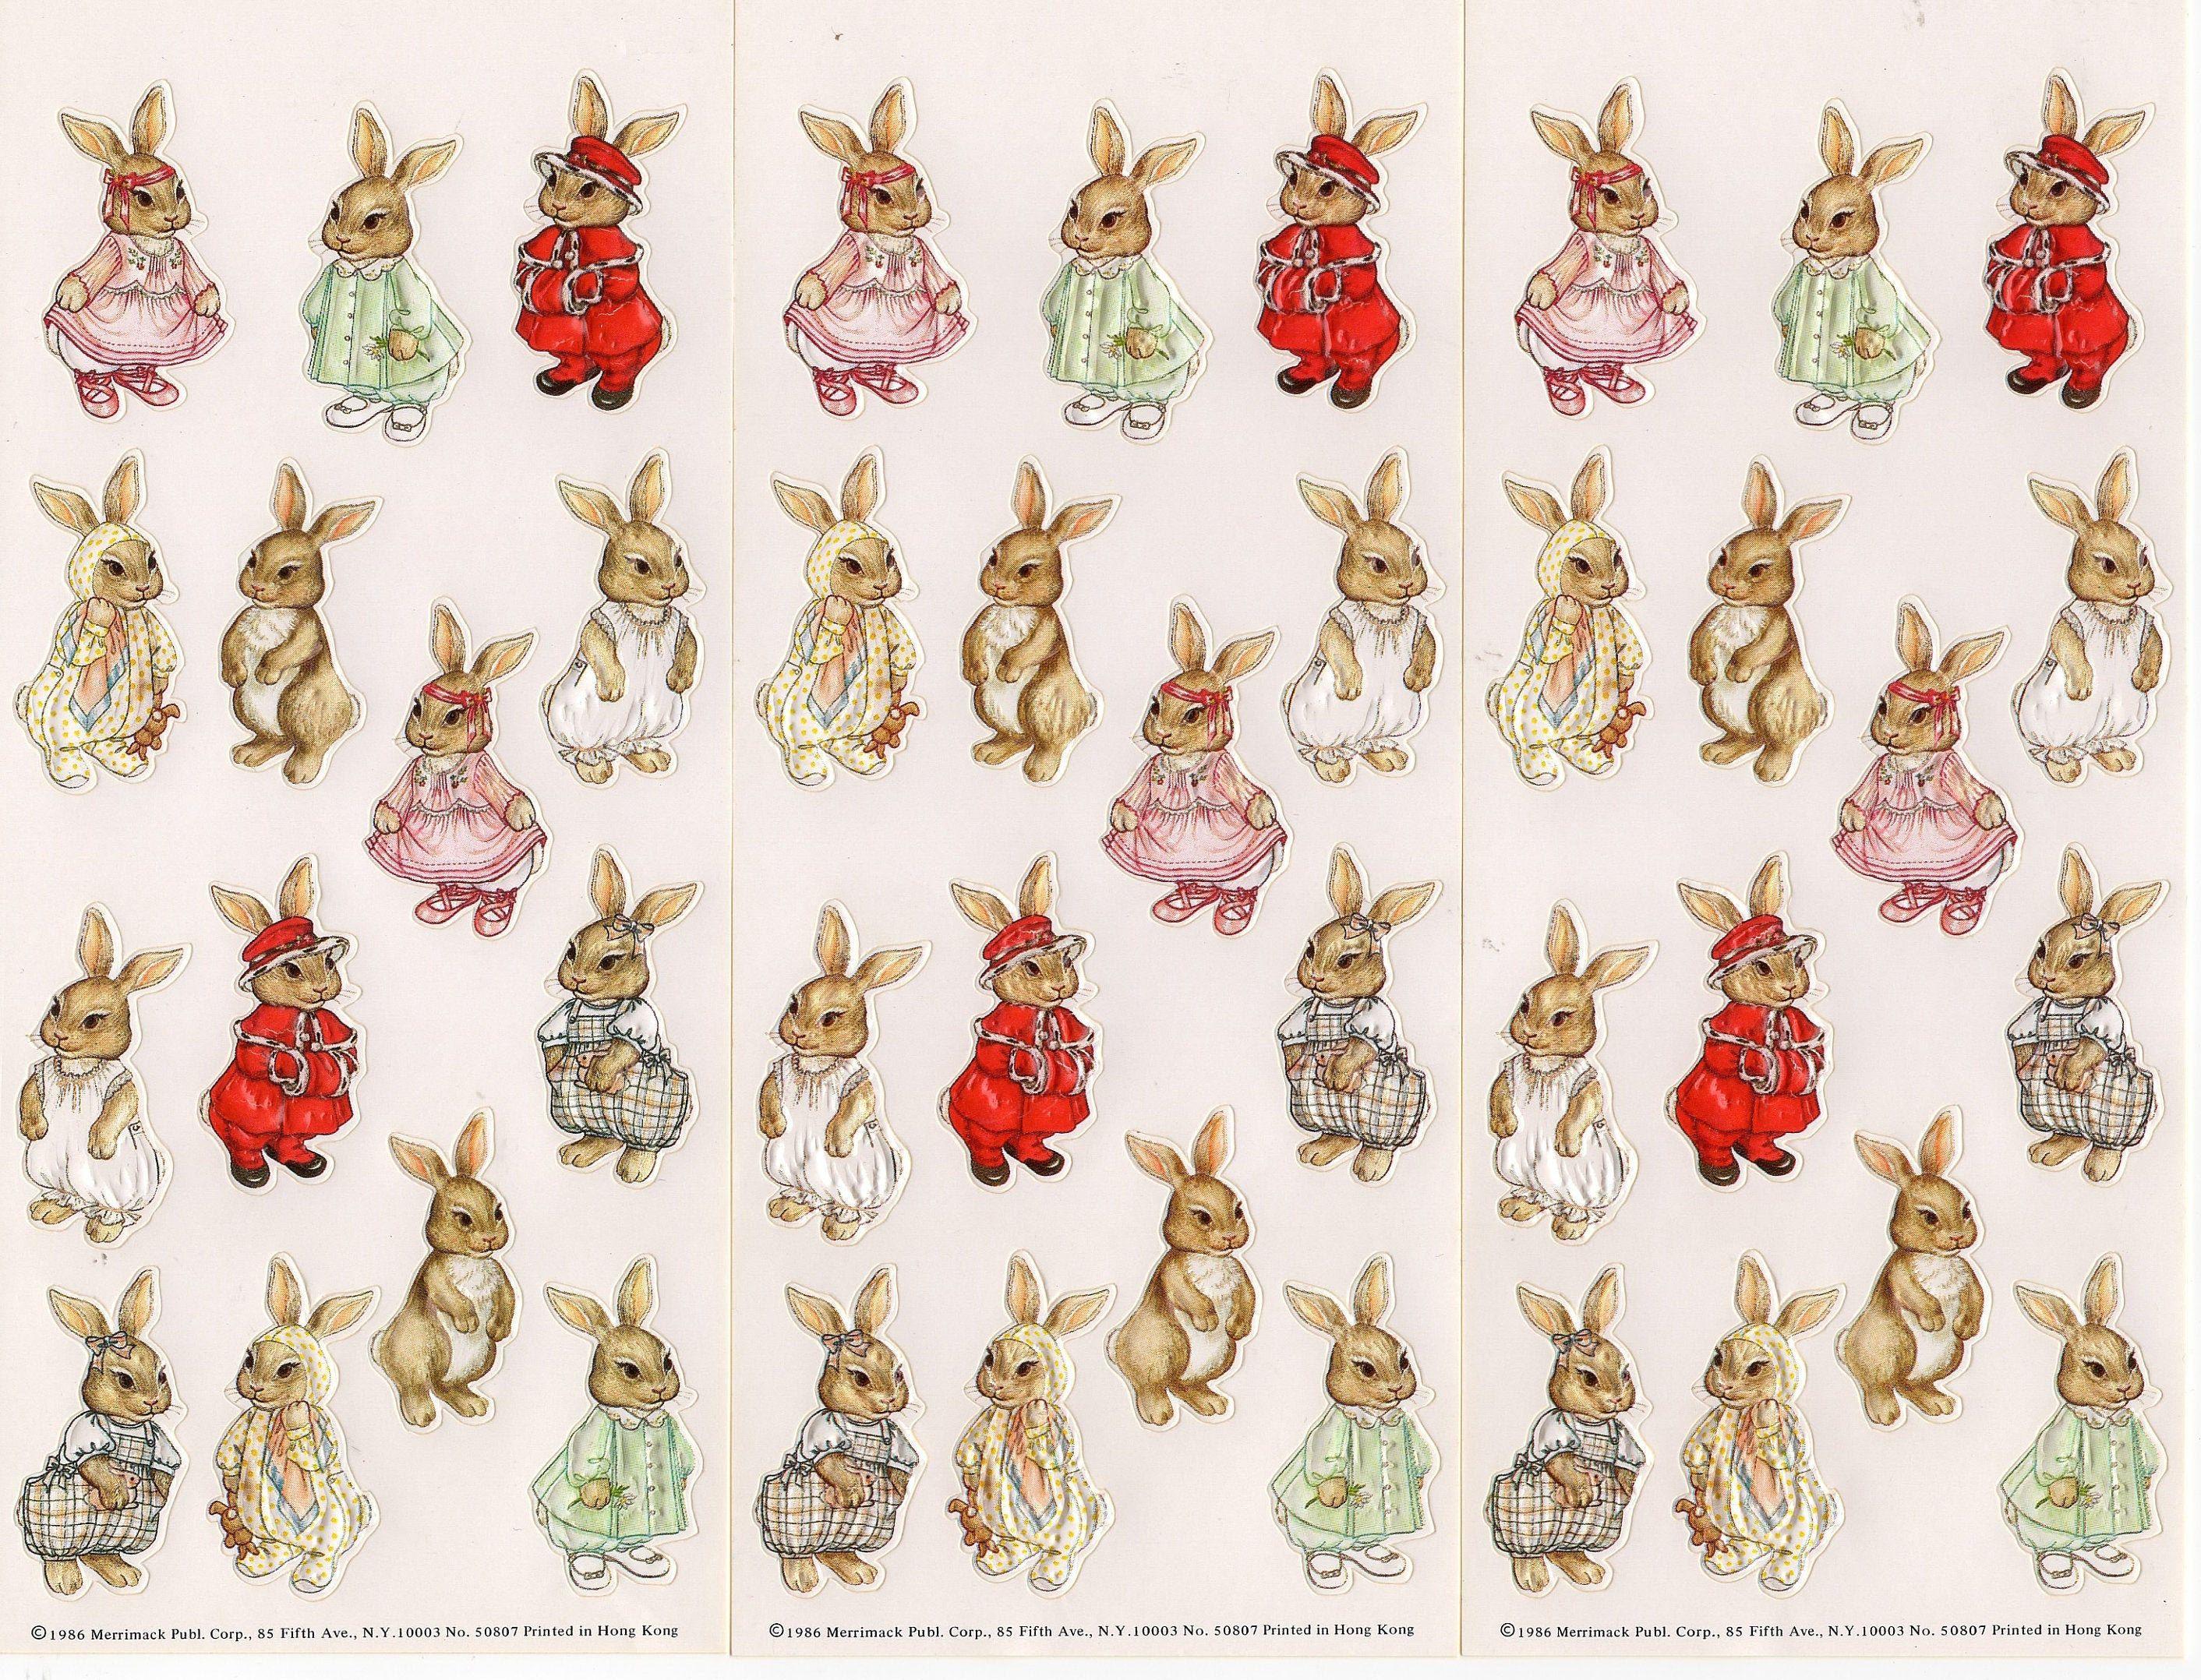 Vintage 1986 Merrimack Publishing Stickers Old Fashion Rabbit Bunny Family Embossed Stickers In 2020 Vintage Etsy Merrimack